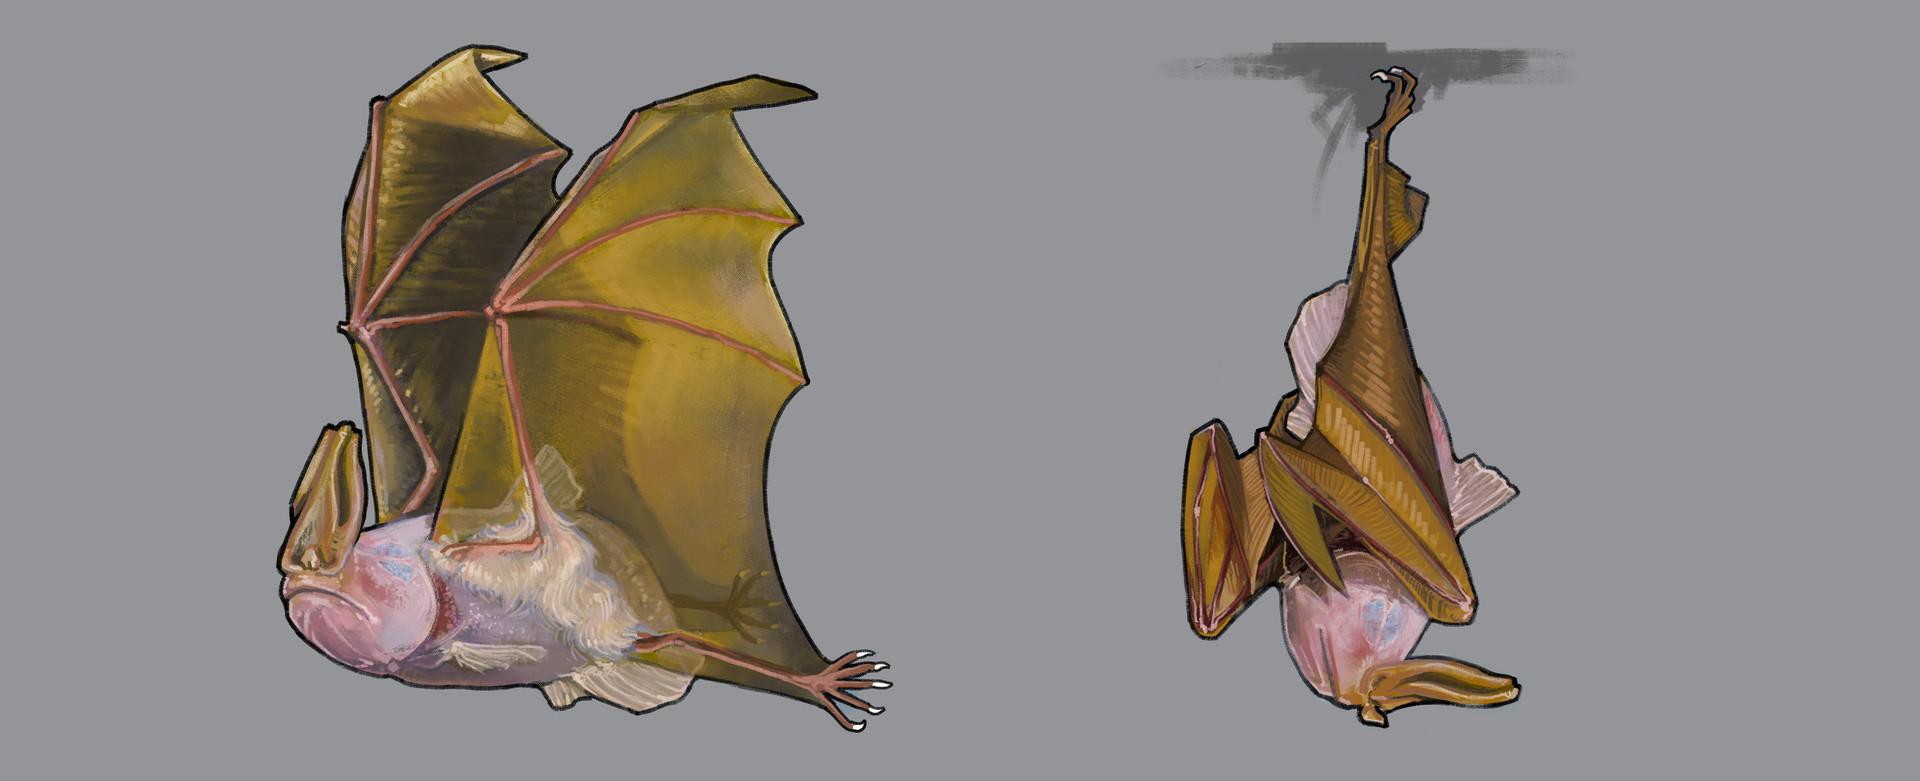 cave bat thesis